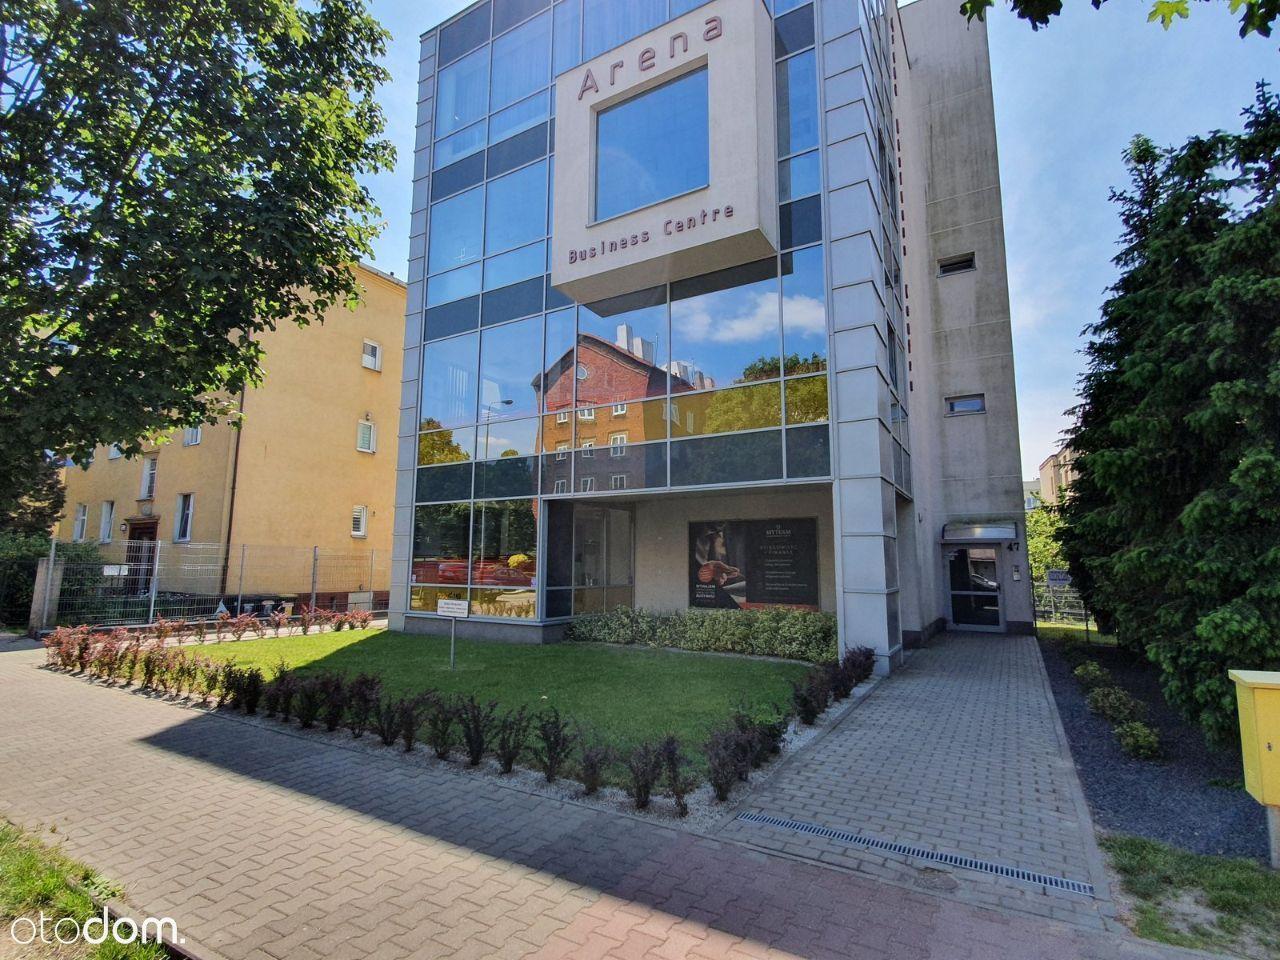 Lokal - 88m2 - Arena Business Centre - 3 Pokoje